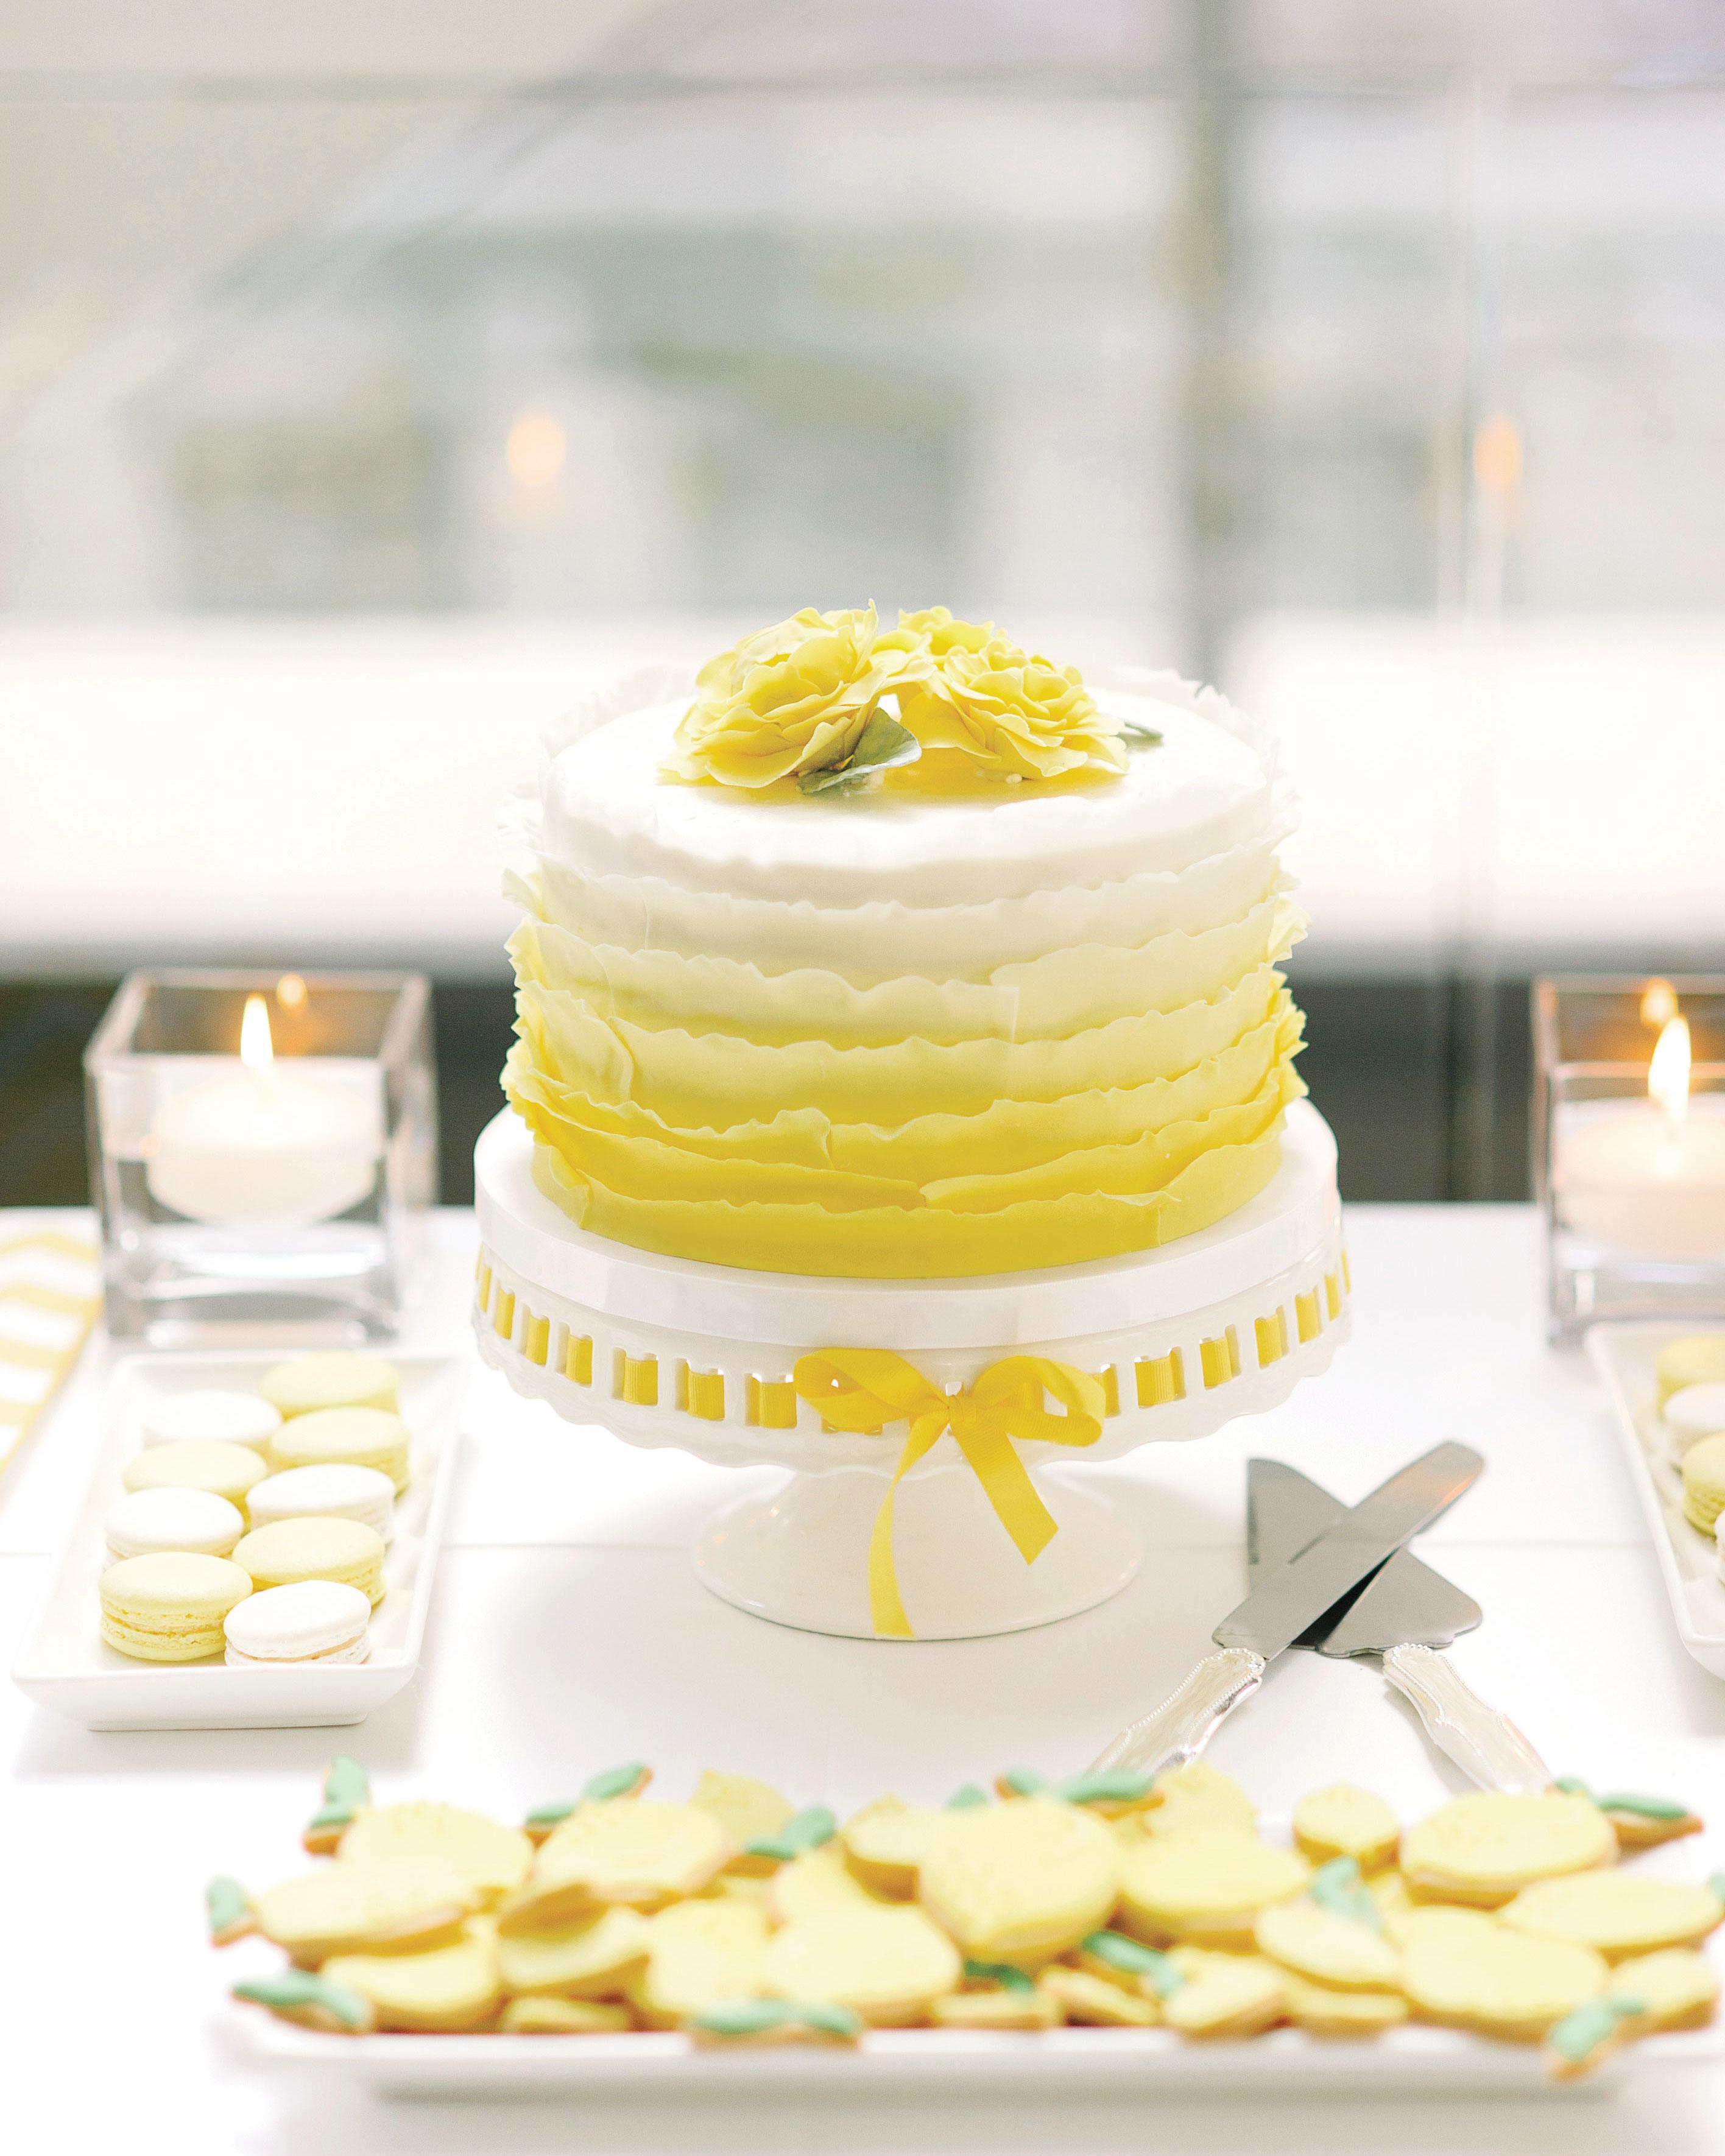 mamy-dan-wedding-canada-details-yellow-cake-floral-009-s112629.jpg